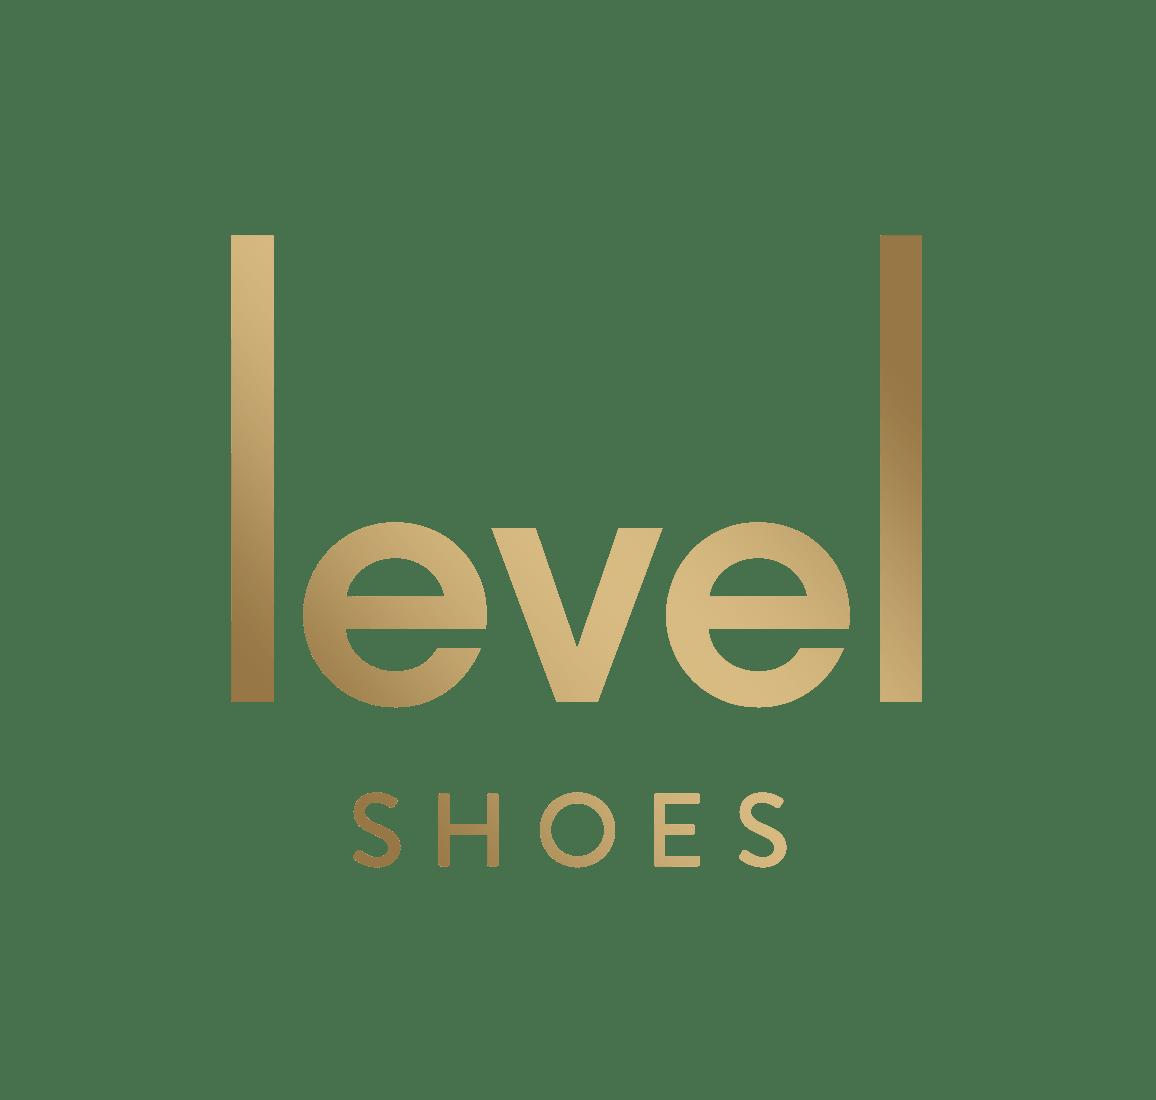 Level Shoes company logo